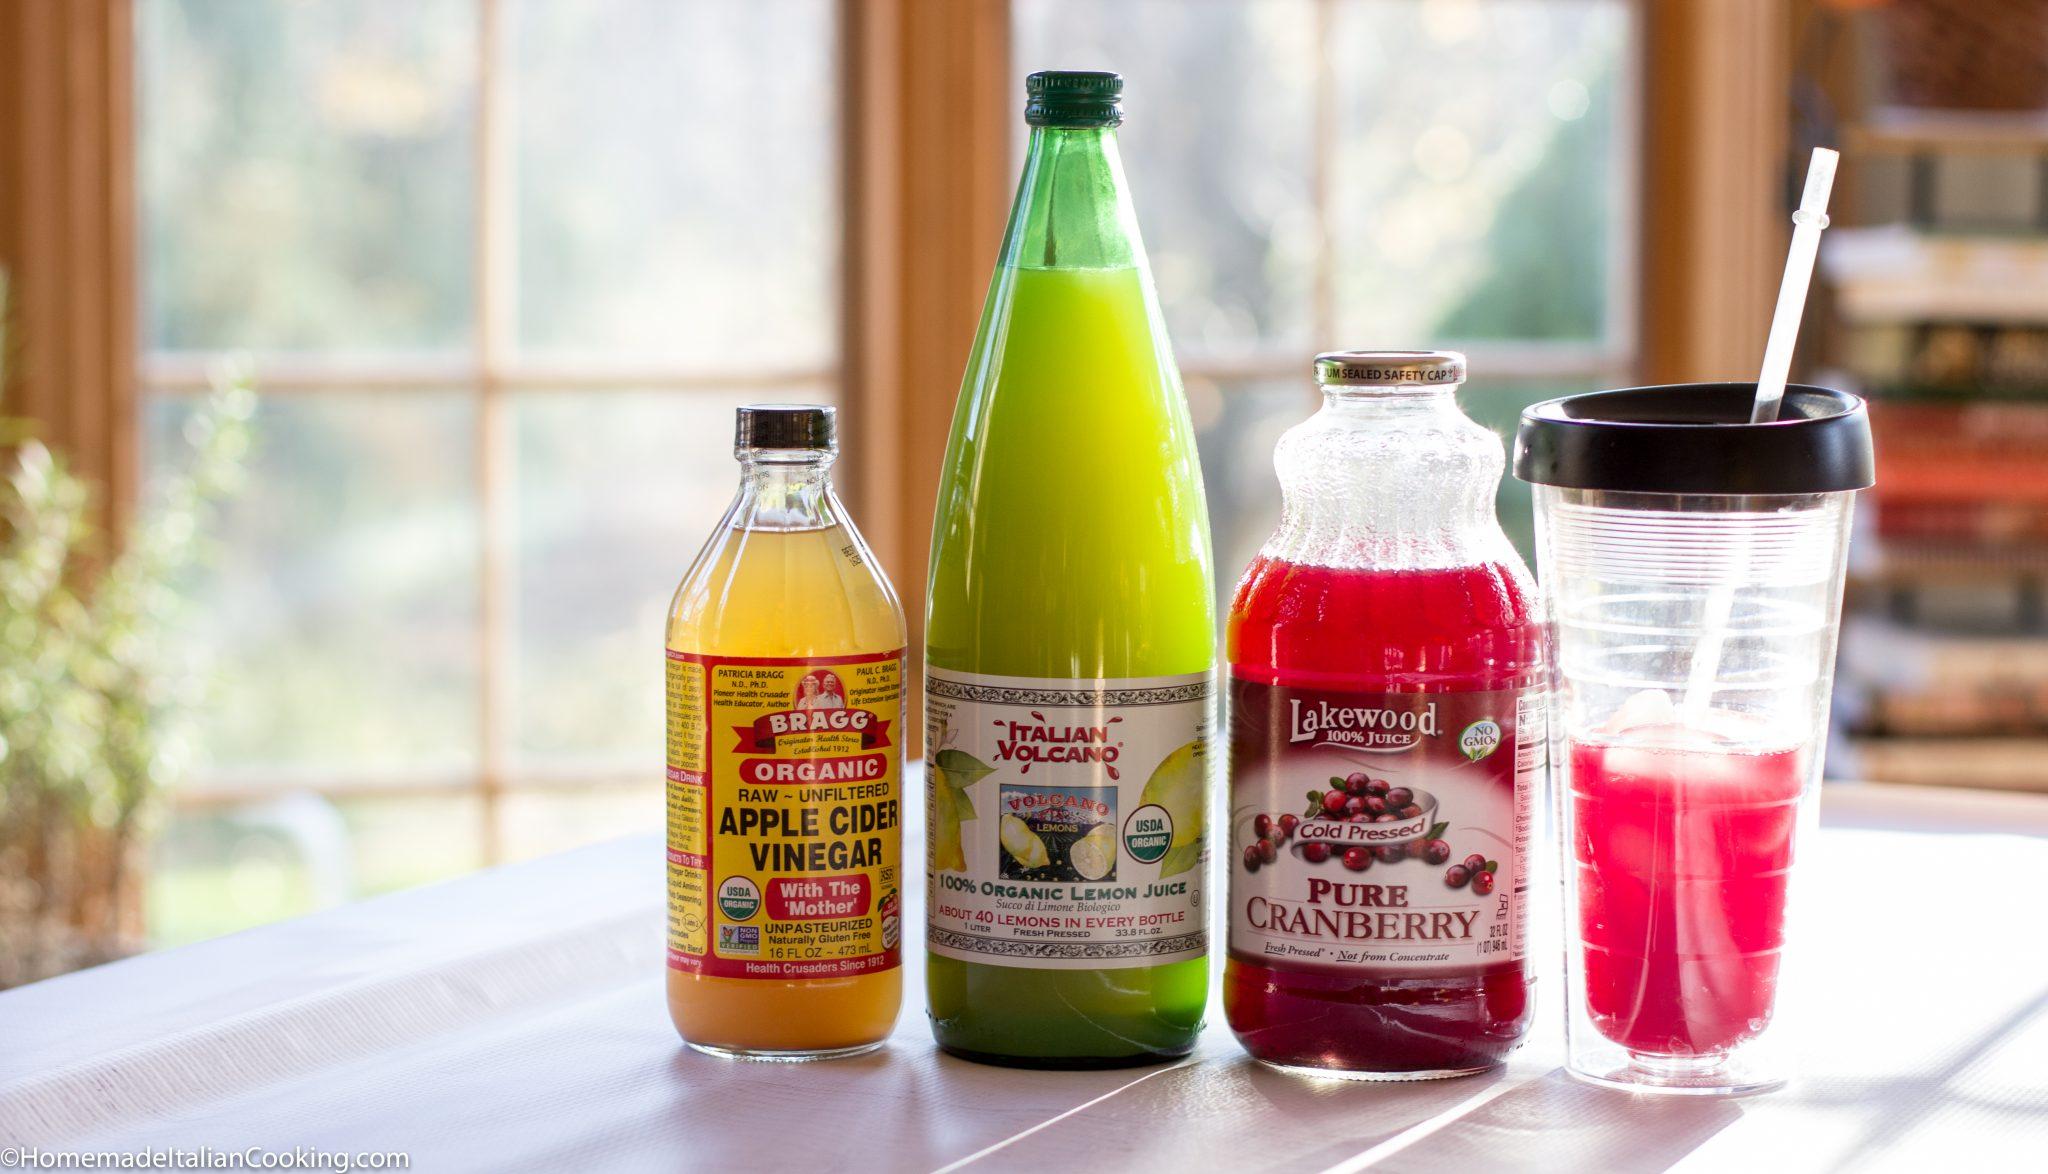 Stupendous Apple Cider Vinegar Lemon Juice Drink Daily Detox Apple Cider Vinegar Lemon Juice Apple Cider Vinegar Uti Bath Apple Cider Vinegar Uti Pregnancy houzz 01 Apple Cider Vinegar Uti